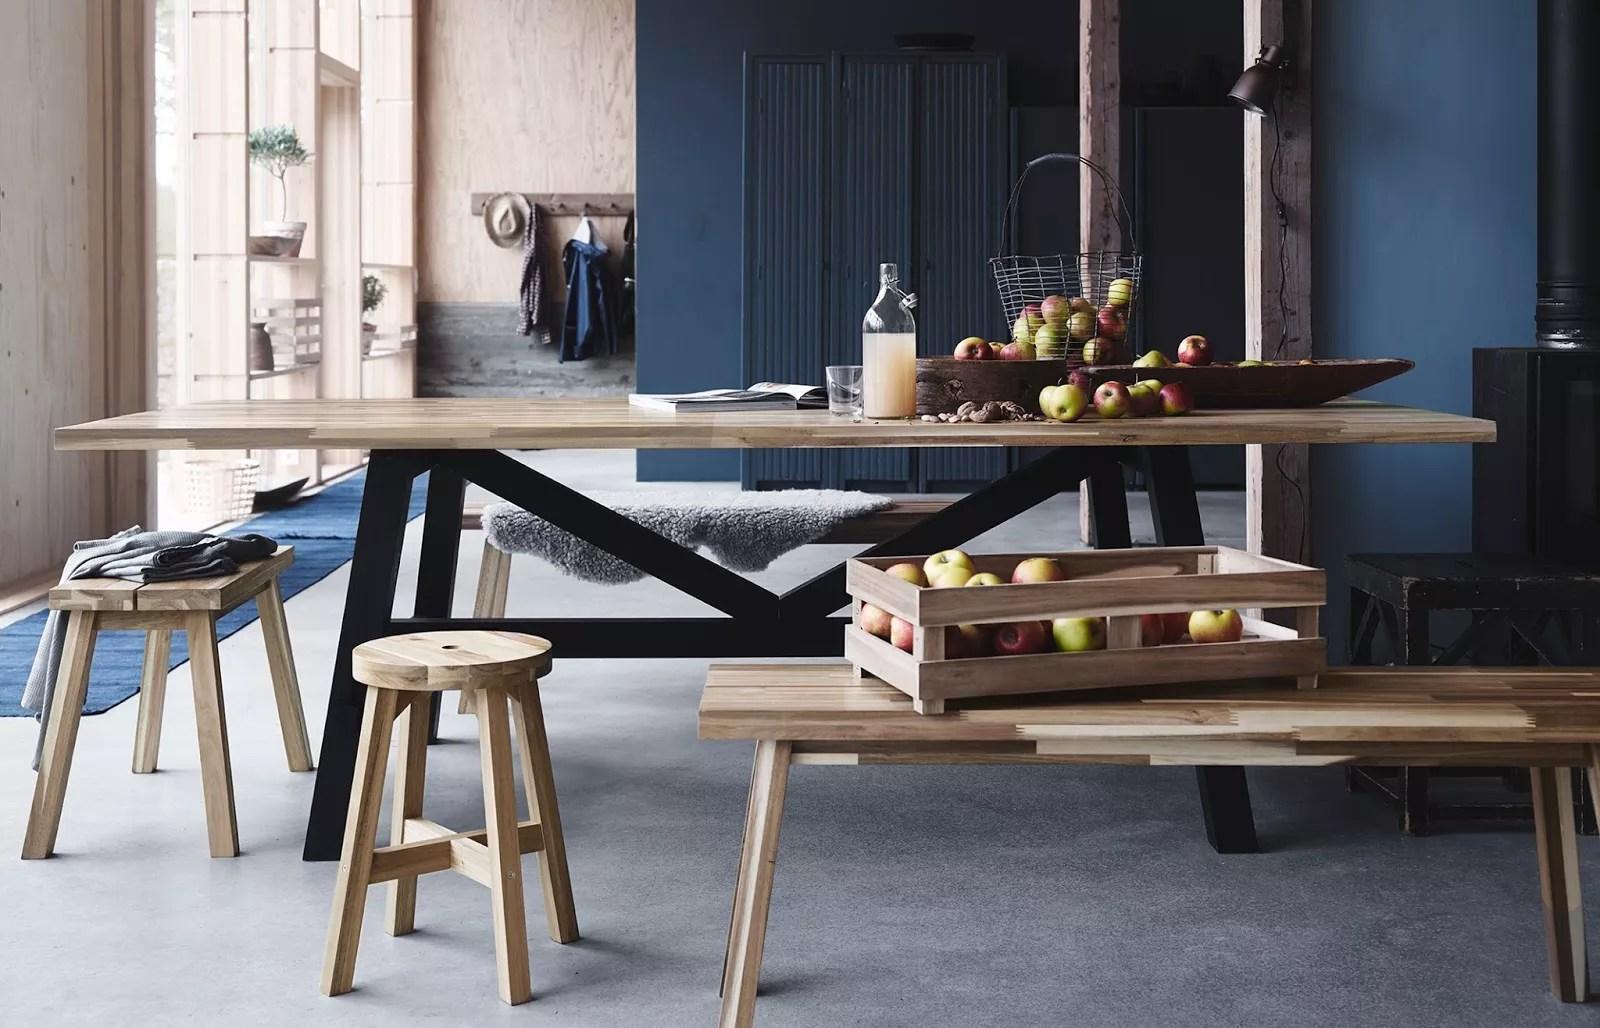 wooden folding table and chairs set chair ebay uk collection skogsta, ikea 2016 paris design week : présente sa nouvelle - photo 4 ...